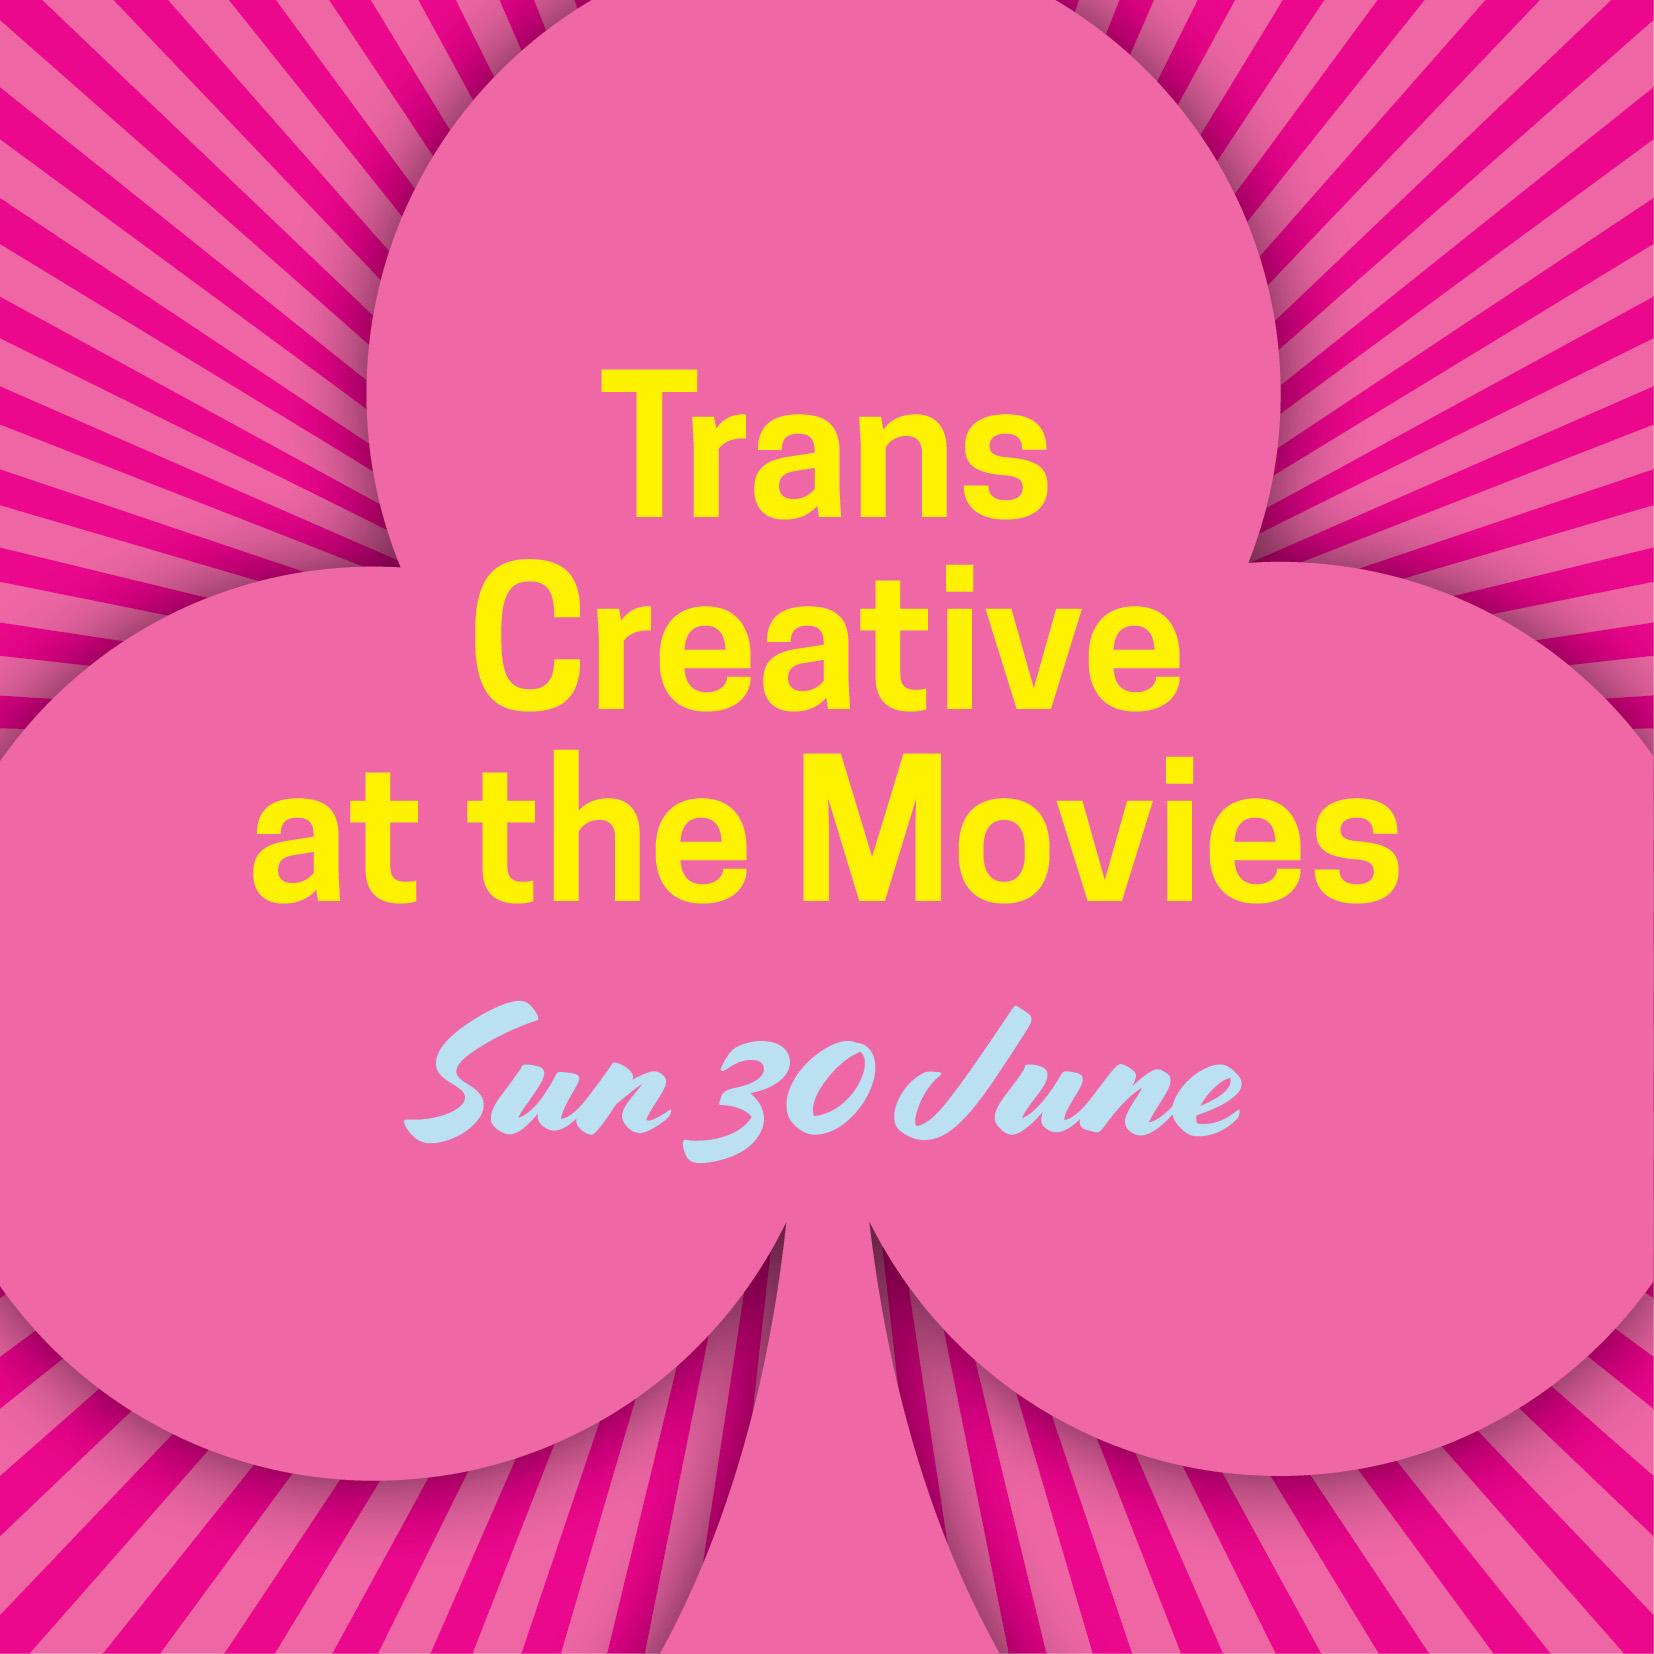 TransVegas_Events2.jpg